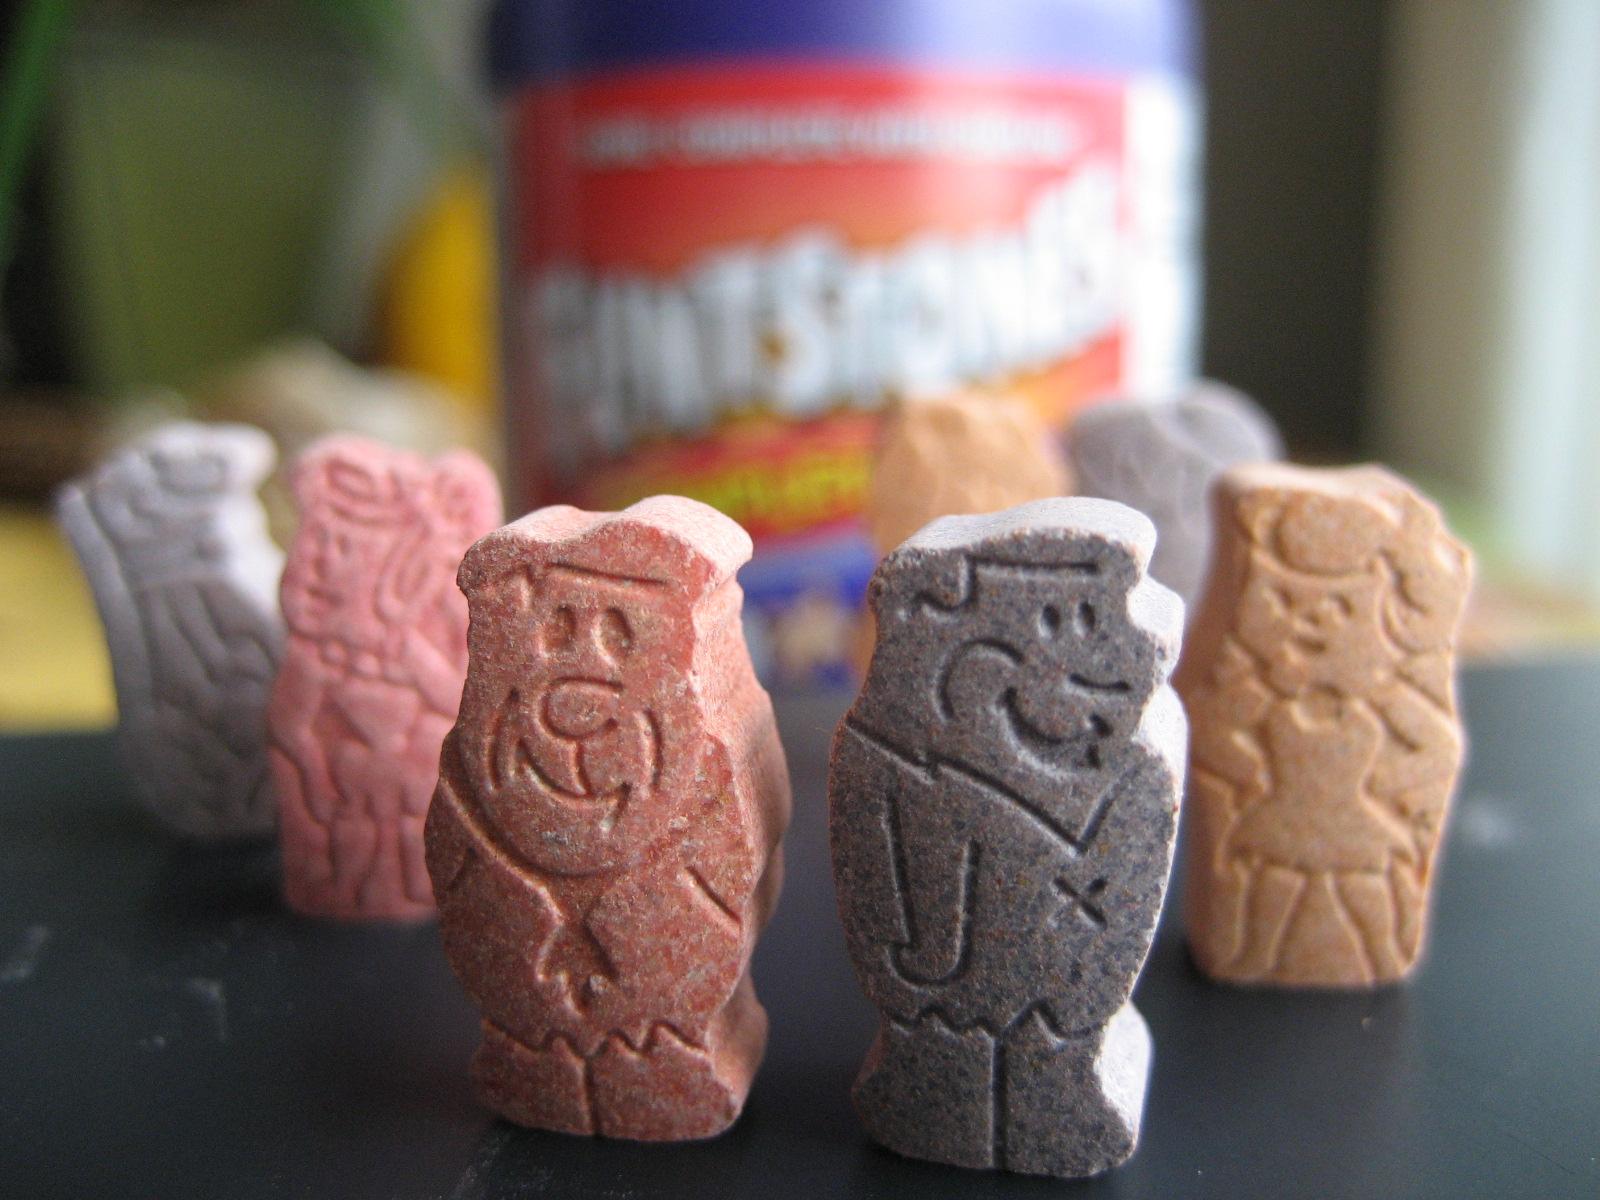 Take your Flintstones